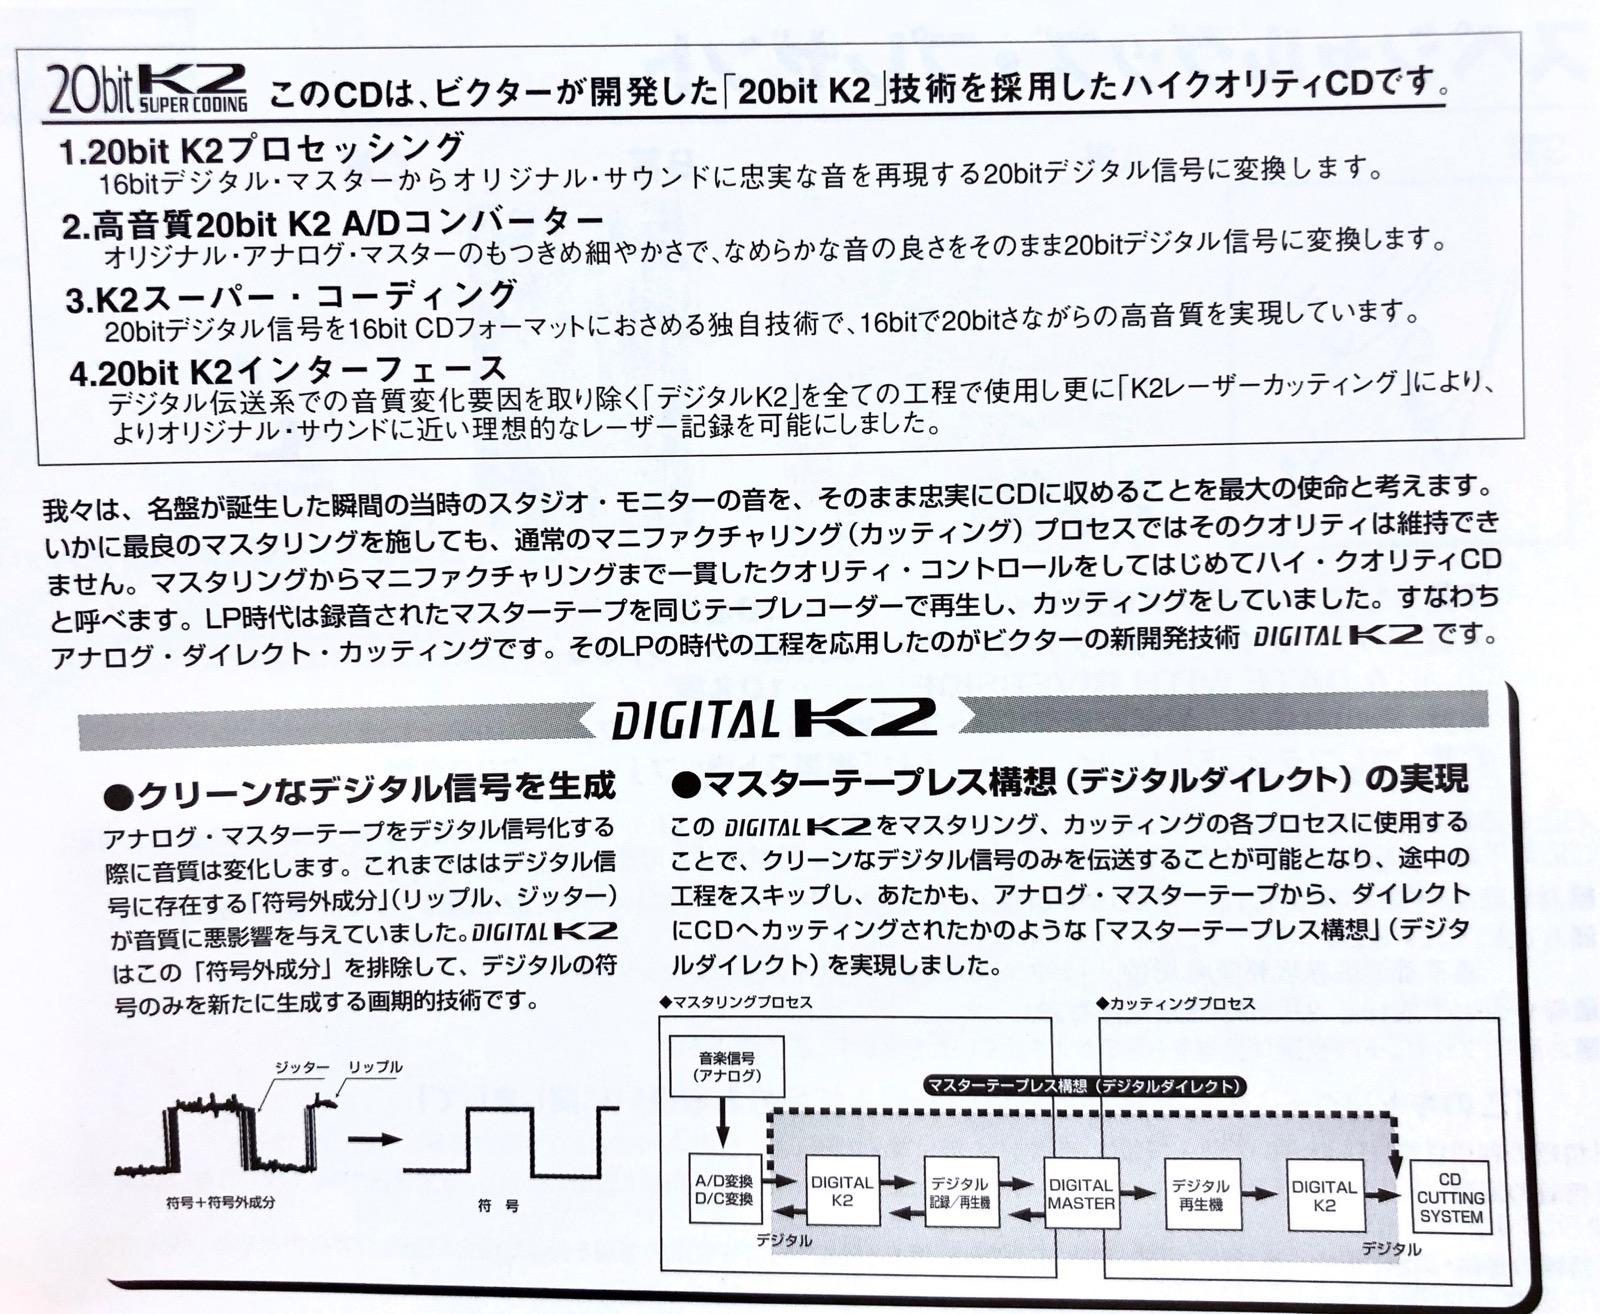 20bit K2 Super codingの説明